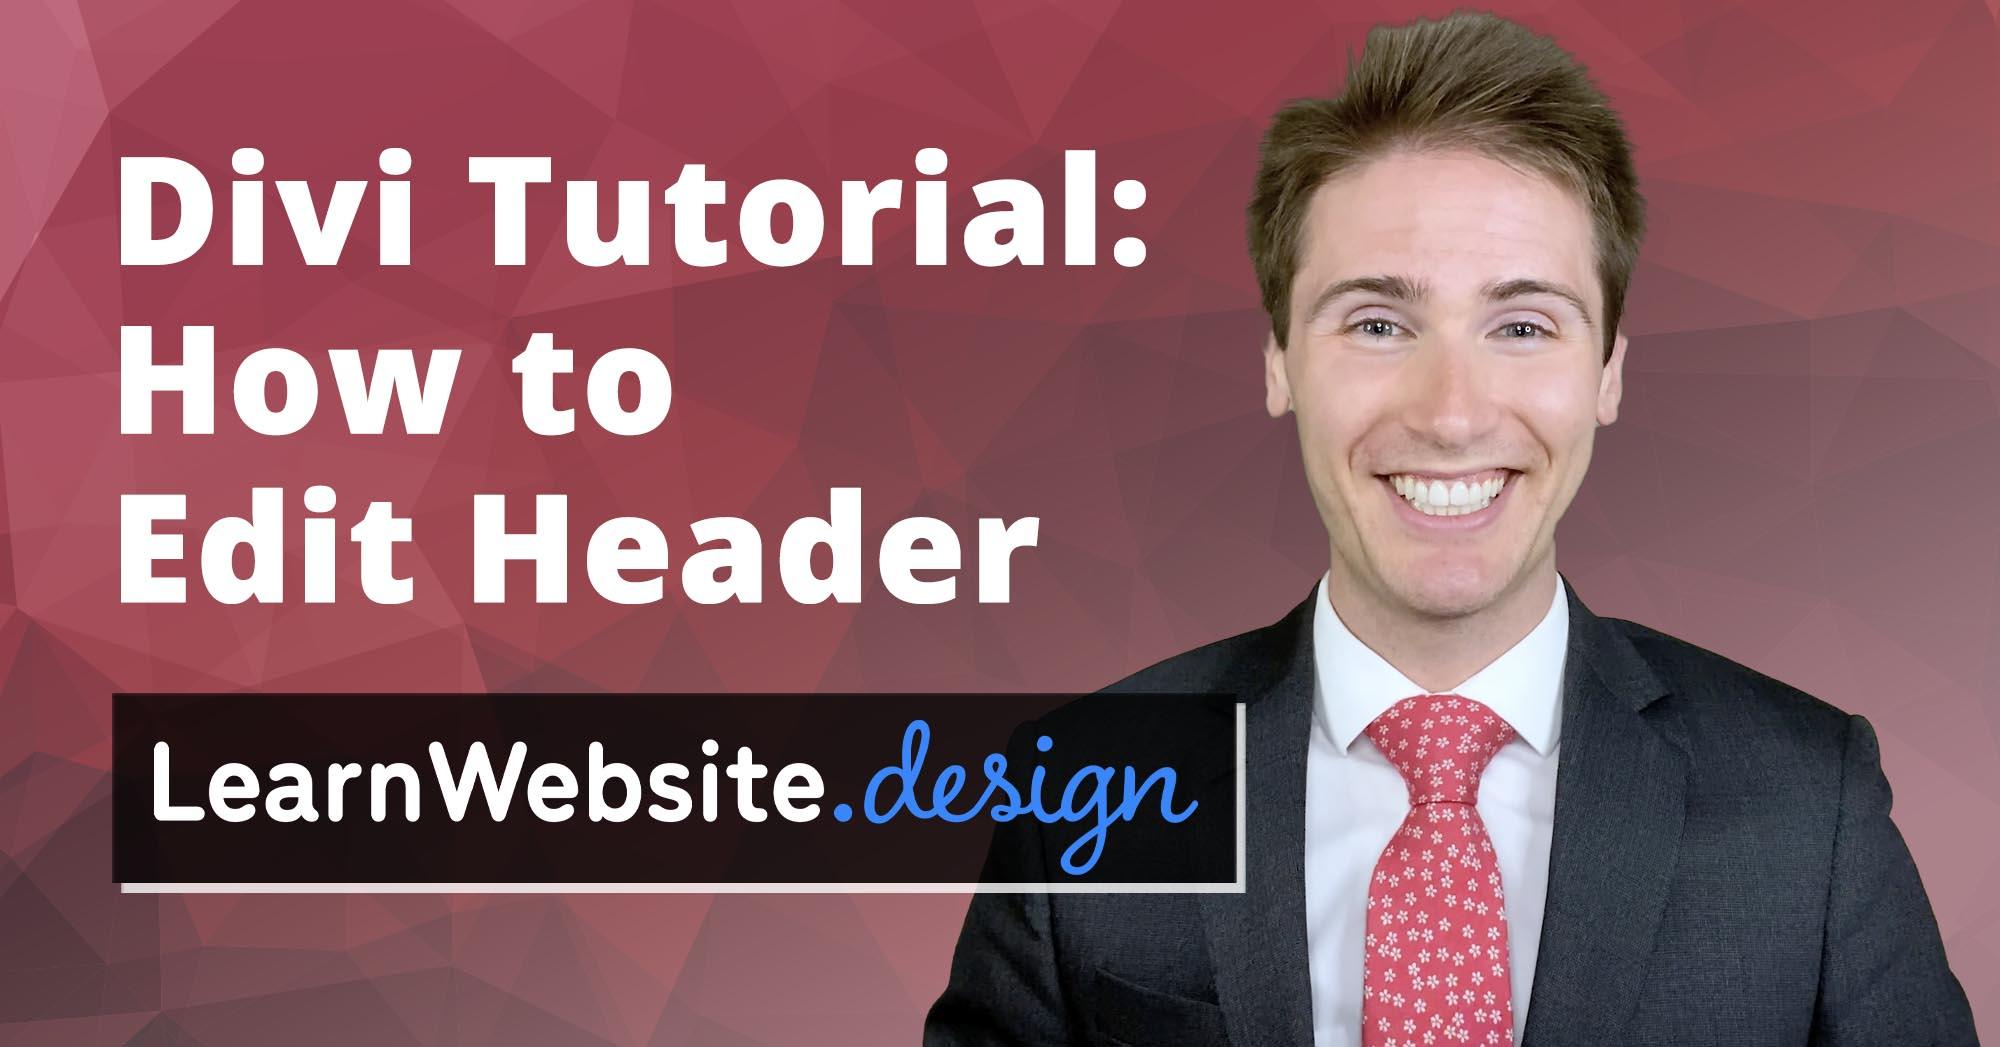 Divi How to Edit Header Tutorial